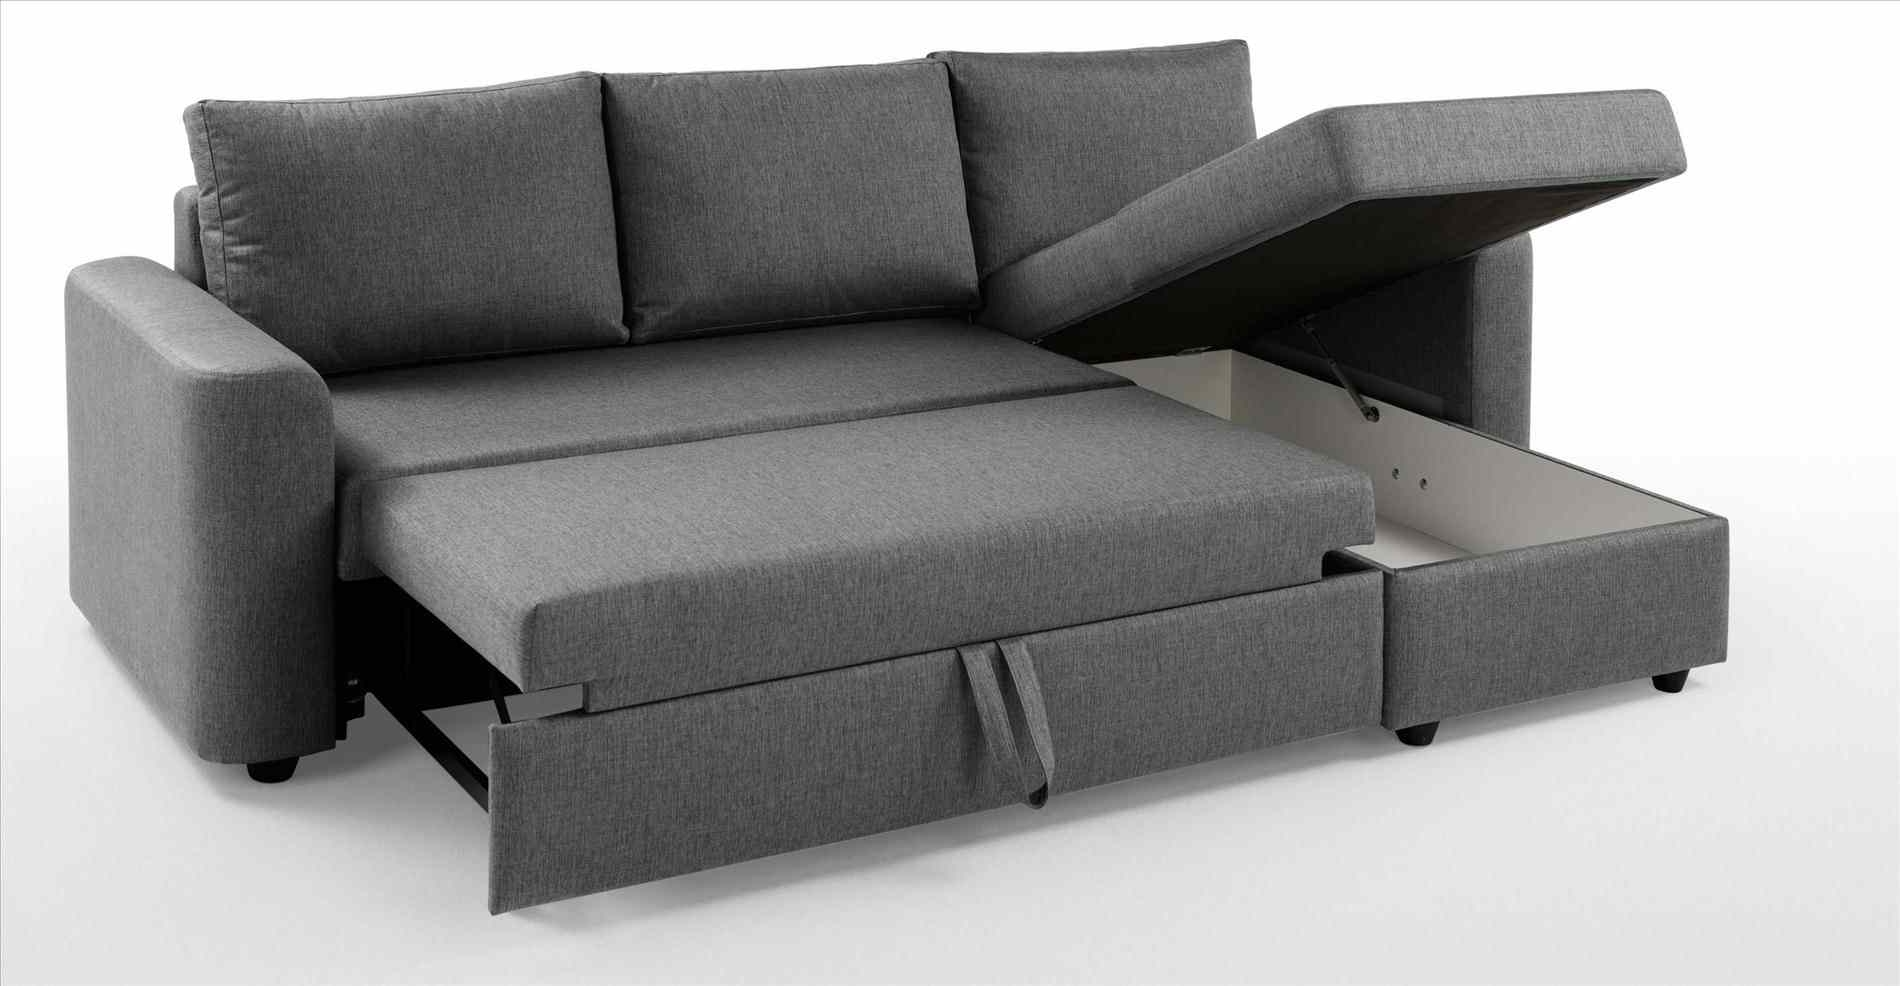 Sofa : Friheten Storage Sofa Bed Corner With Skiftebo Dark Gray Ikea In Sectional Sofas In Philippines (Image 7 of 10)